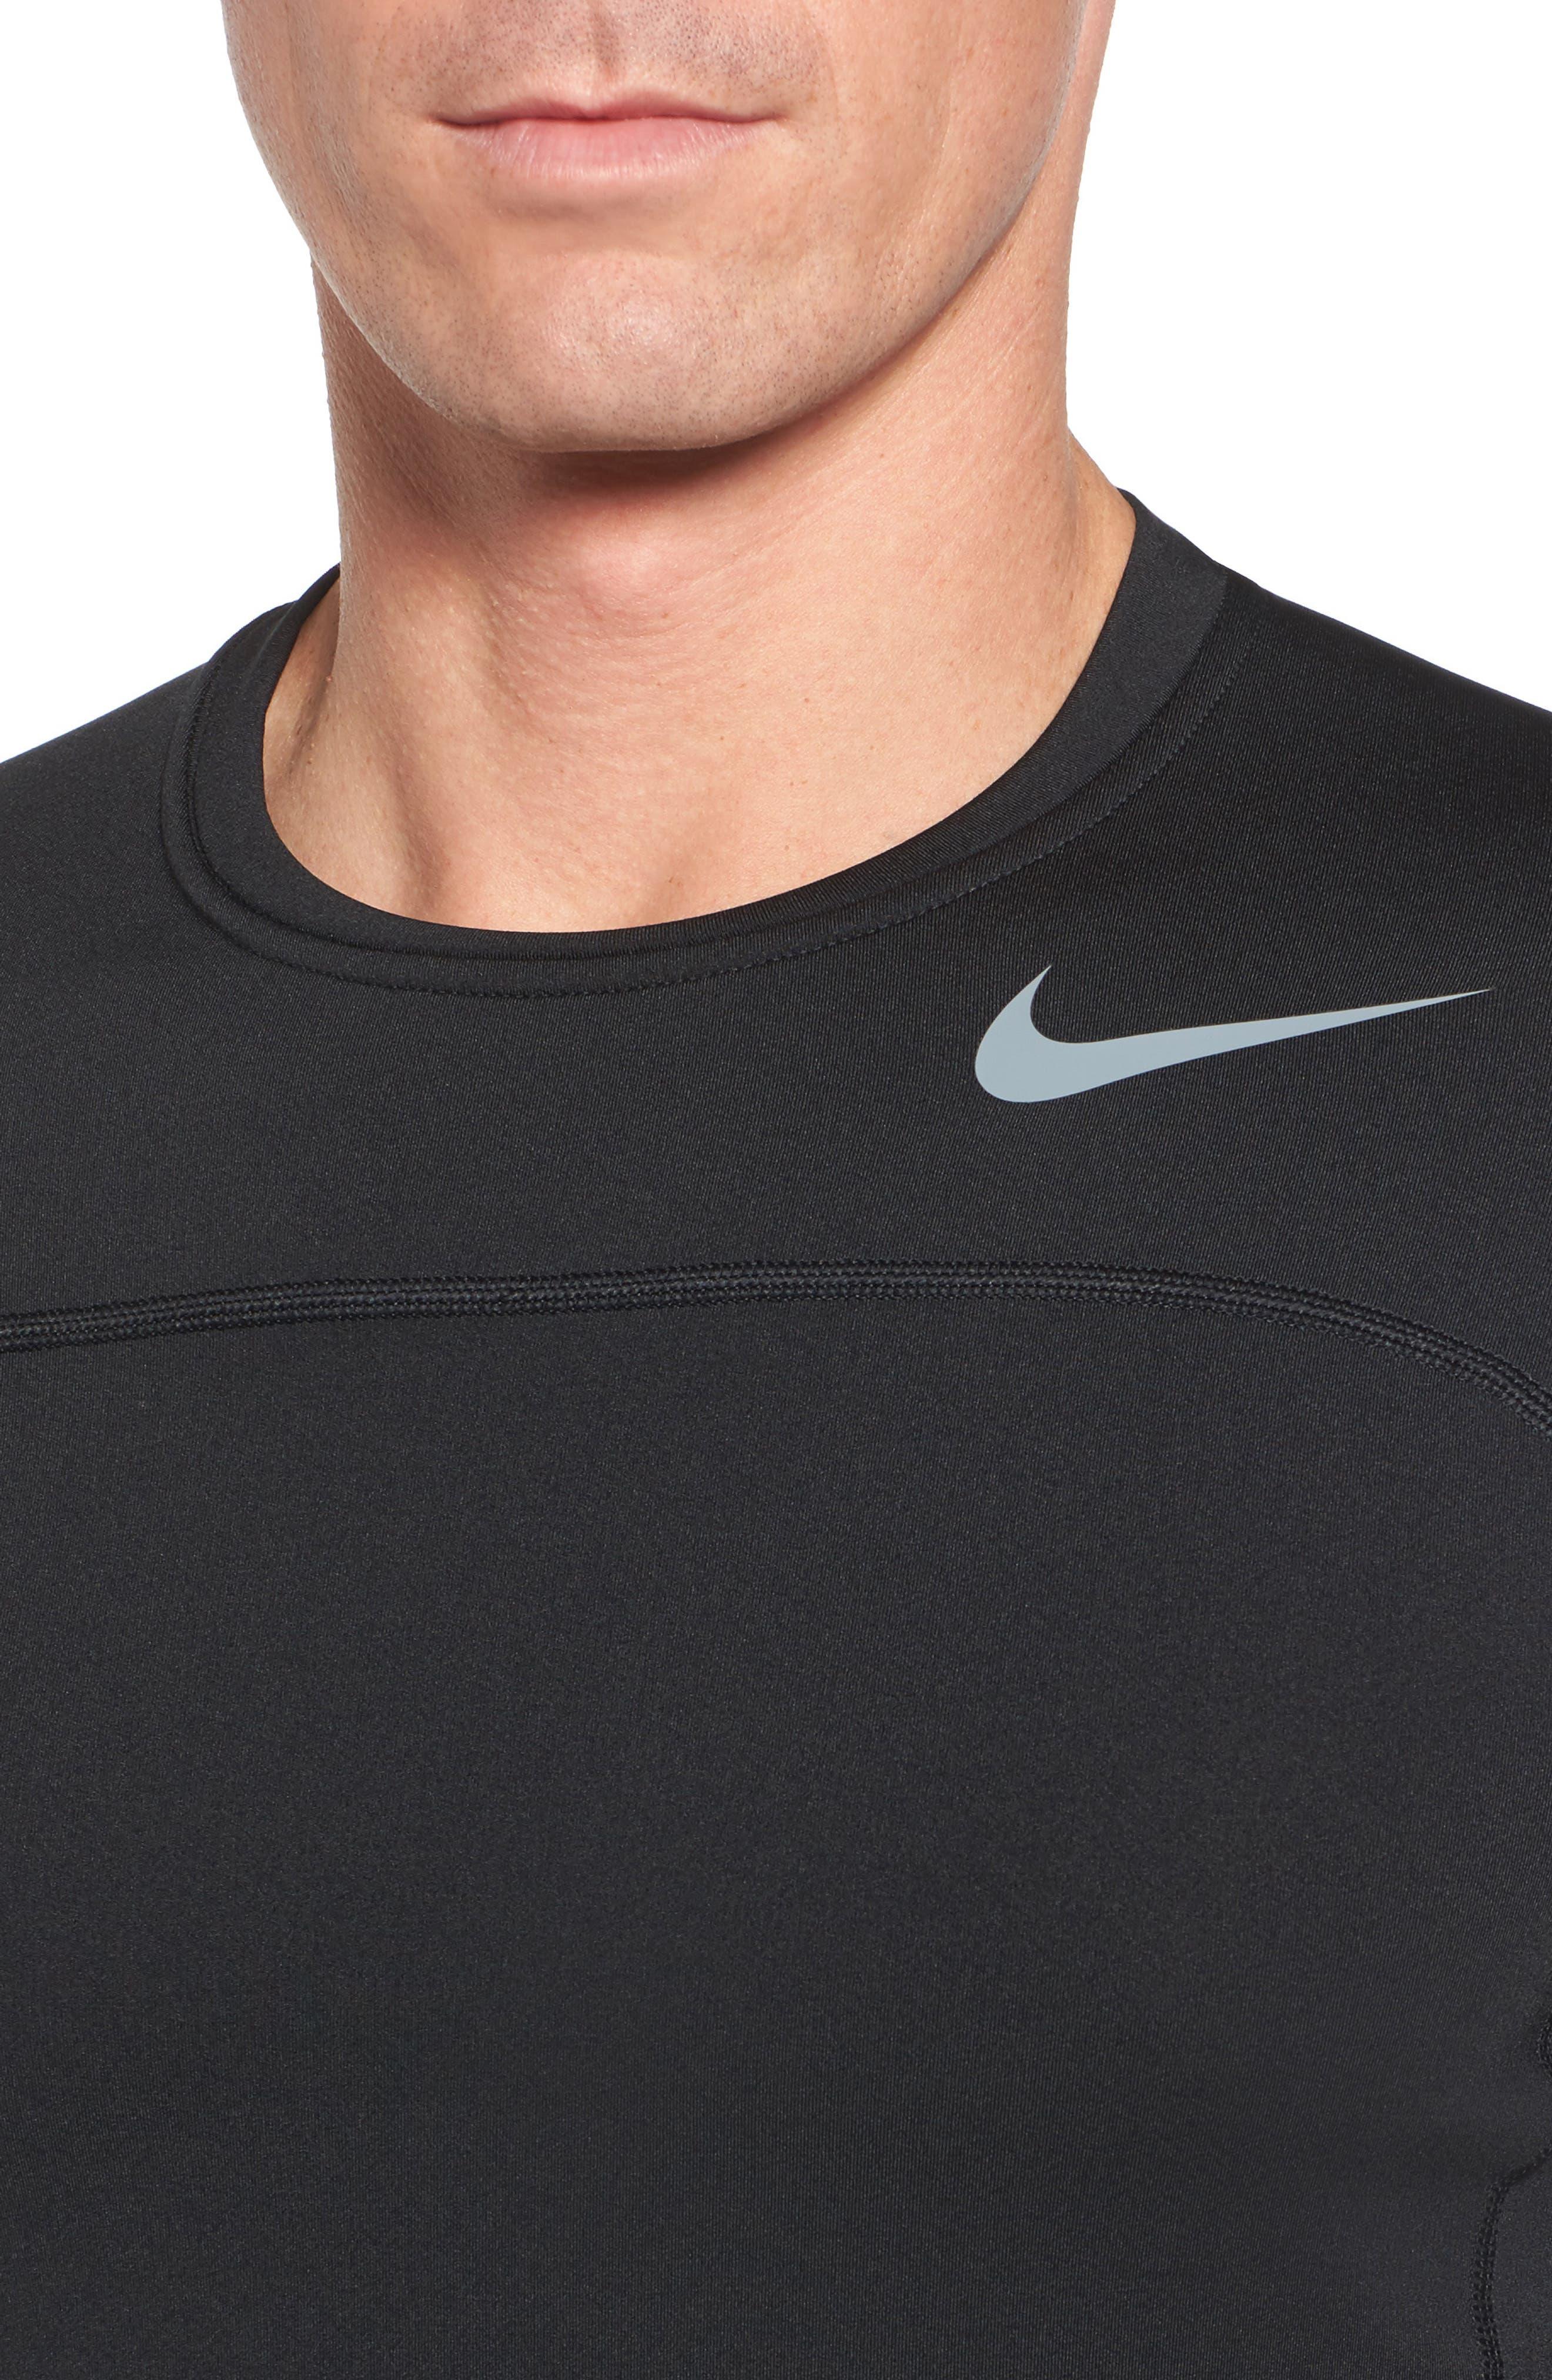 Pro Long Sleeve Training T-Shirt,                             Alternate thumbnail 4, color,                             010